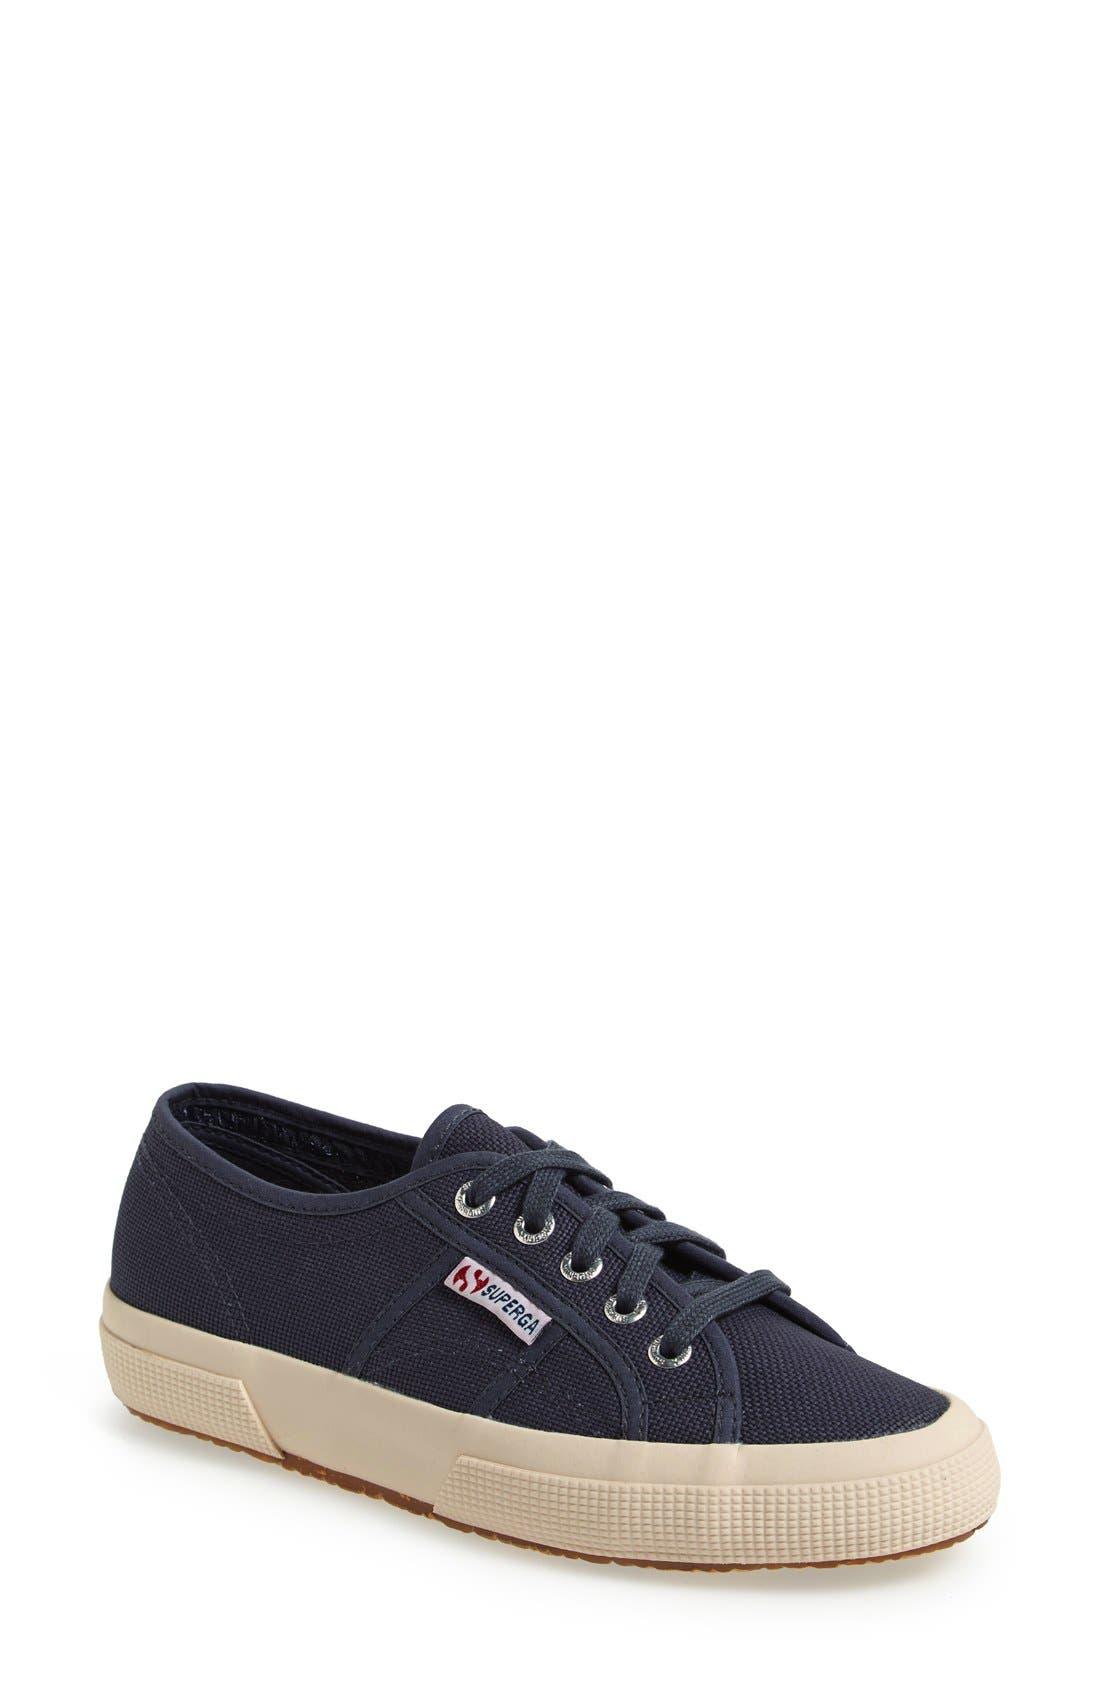 'Cotu' Sneaker,                             Main thumbnail 1, color,                             Navy Canvas